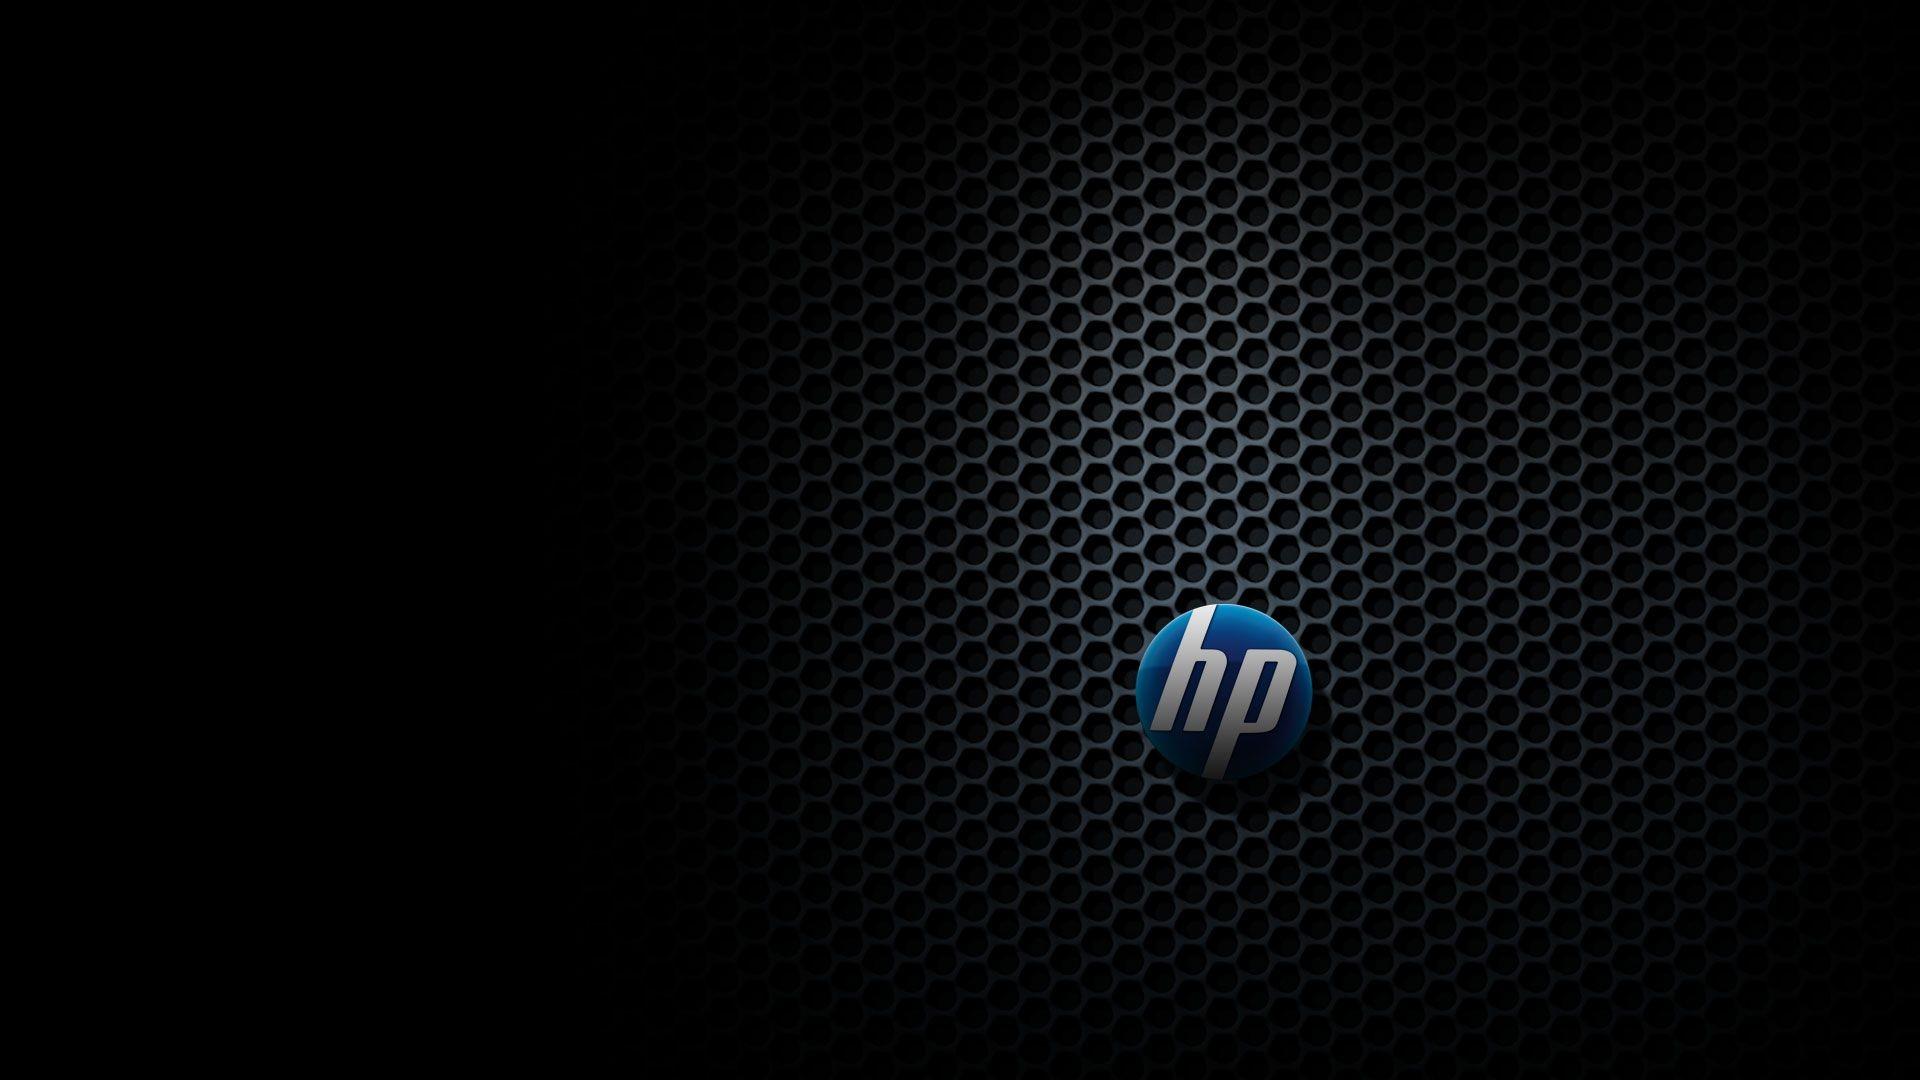 hp desktop wallpapers hd 1080p | Desktop Backgrounds for Free HD .